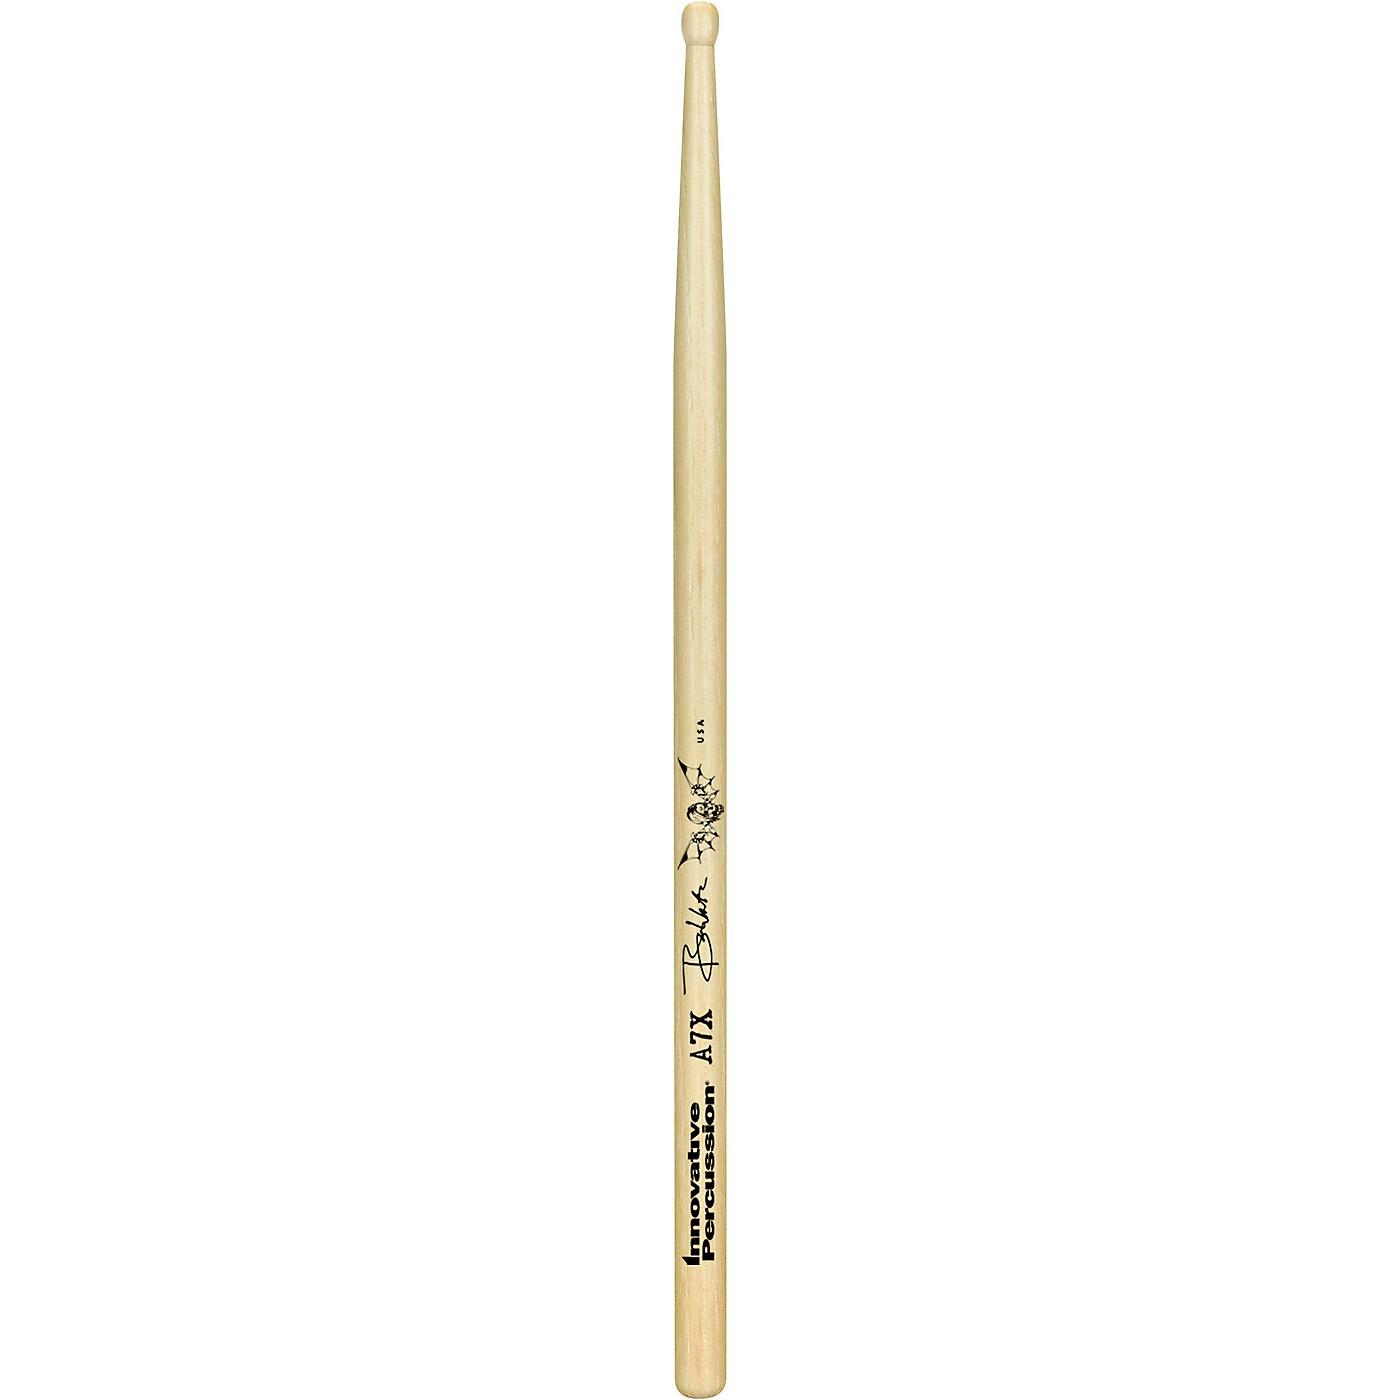 Innovative Percussion A7X Brooks Wackerman Signature Drum Stick thumbnail